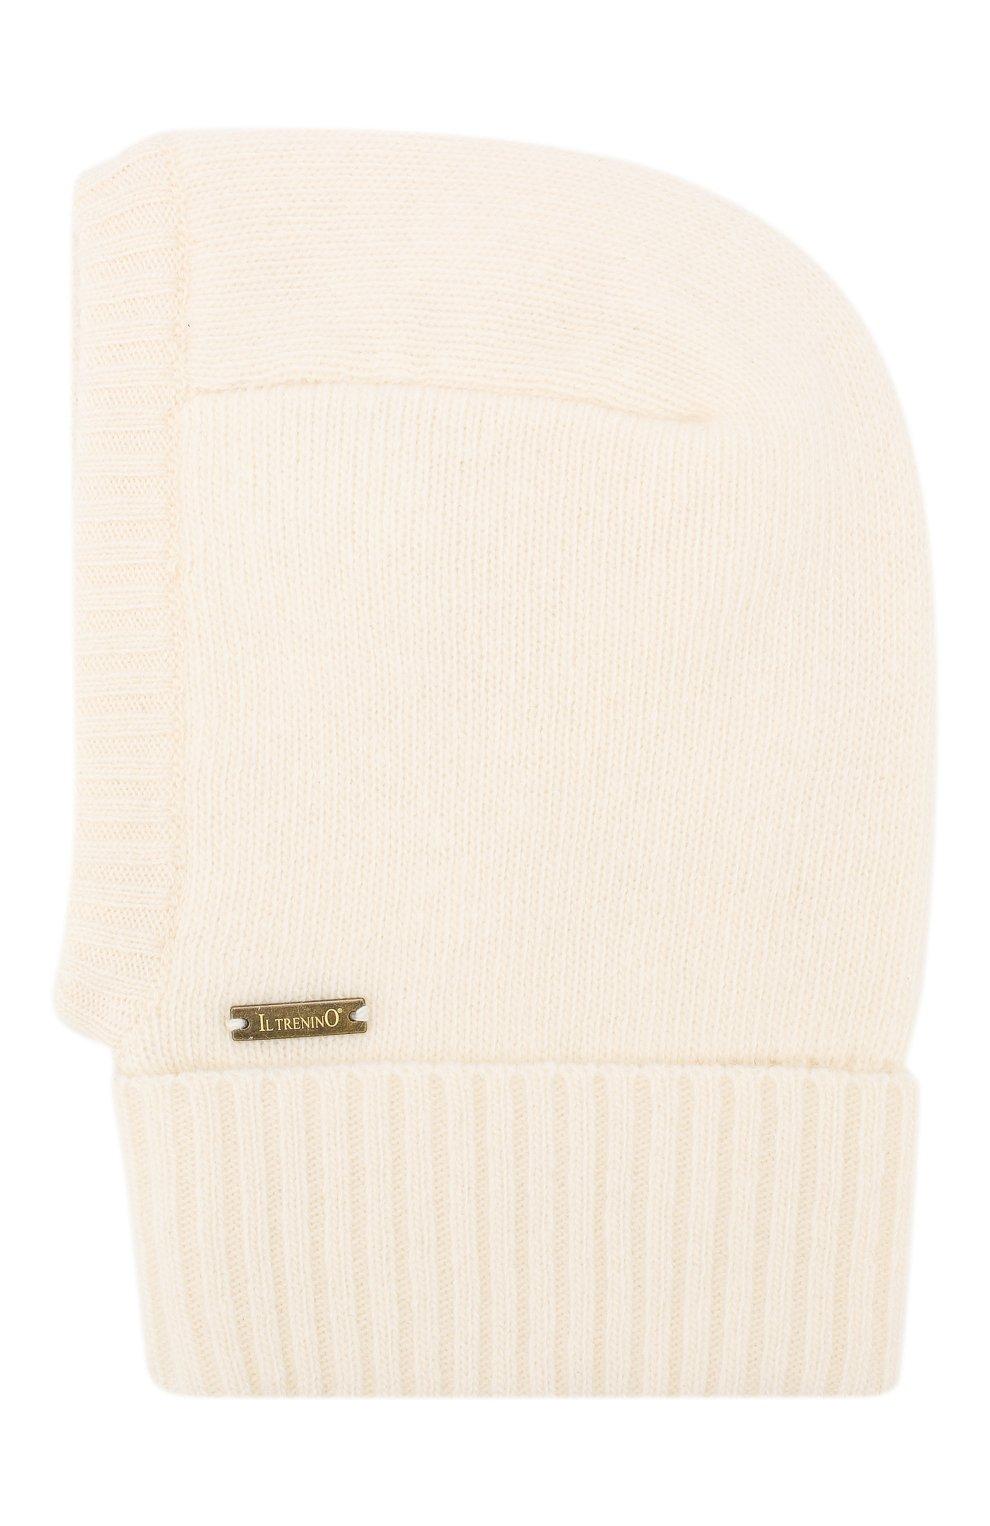 Детского шапка-балаклава из шерсти и кашемира IL TRENINO белого цвета, арт. 18 7529/E2   Фото 2